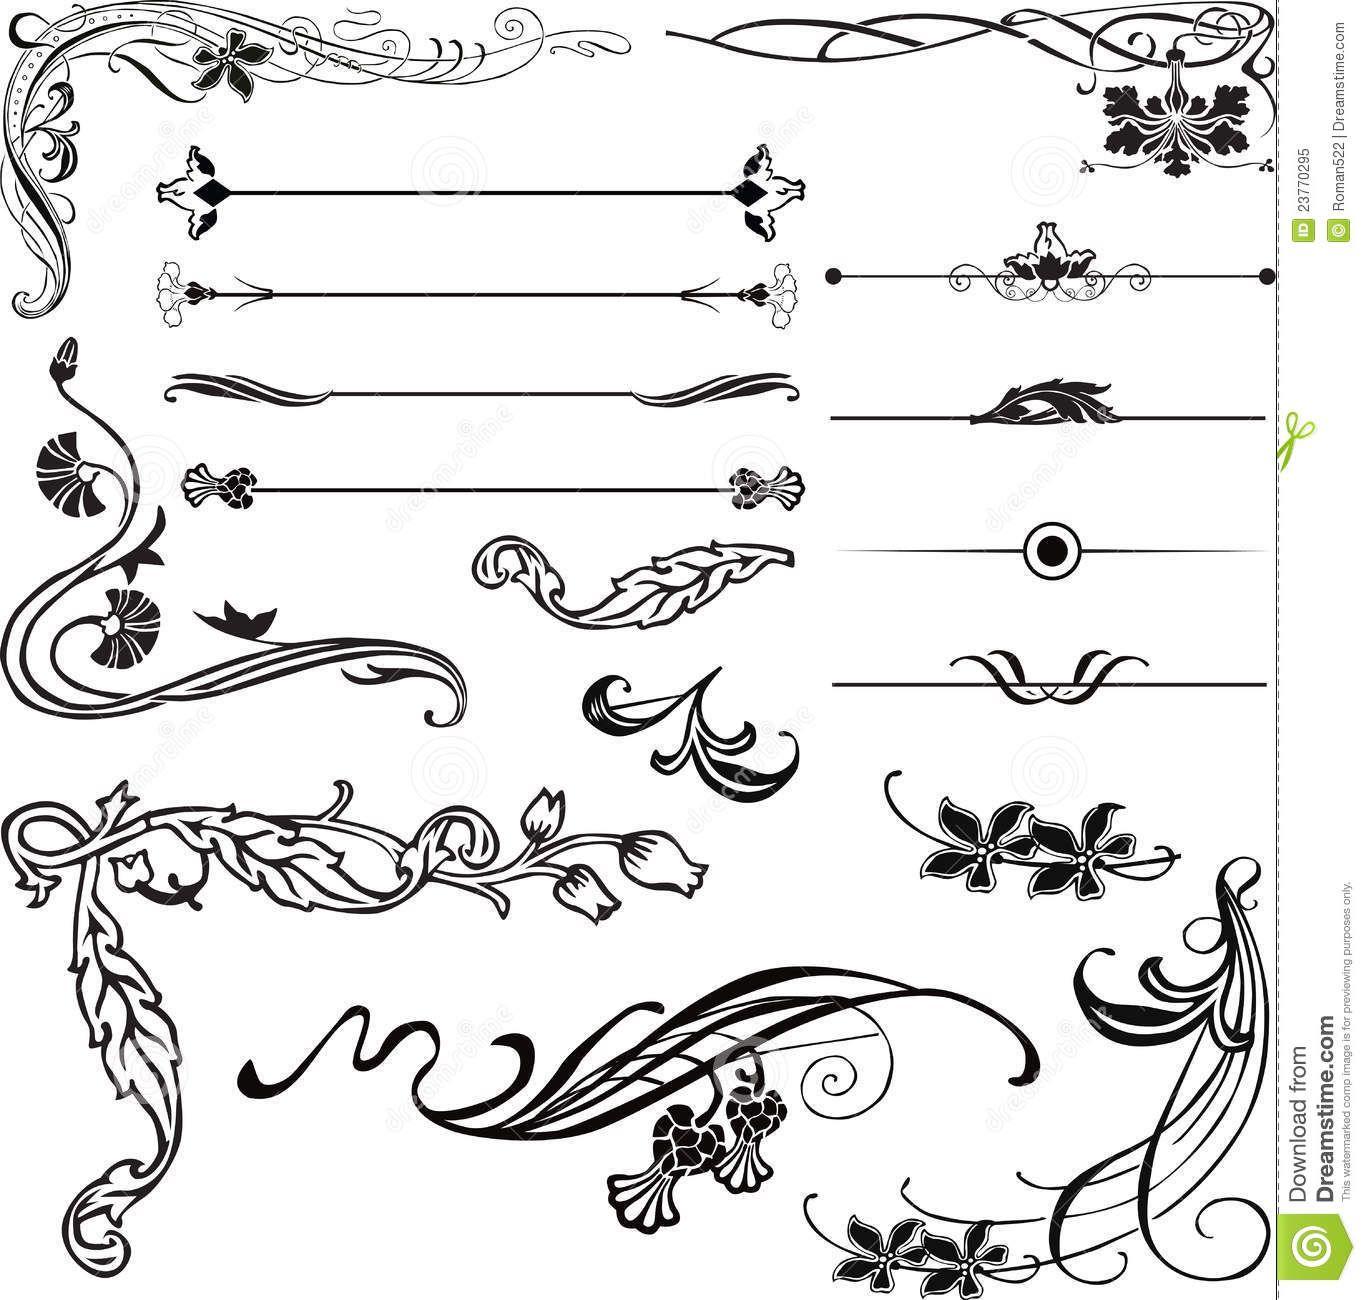 Art deco ornaments - Vector Clipart Of Art Nouveau Corners And Dividers Art Nouveau Ornament Search Clip Art Illustration Drawings And Vector Eps Graphics Images